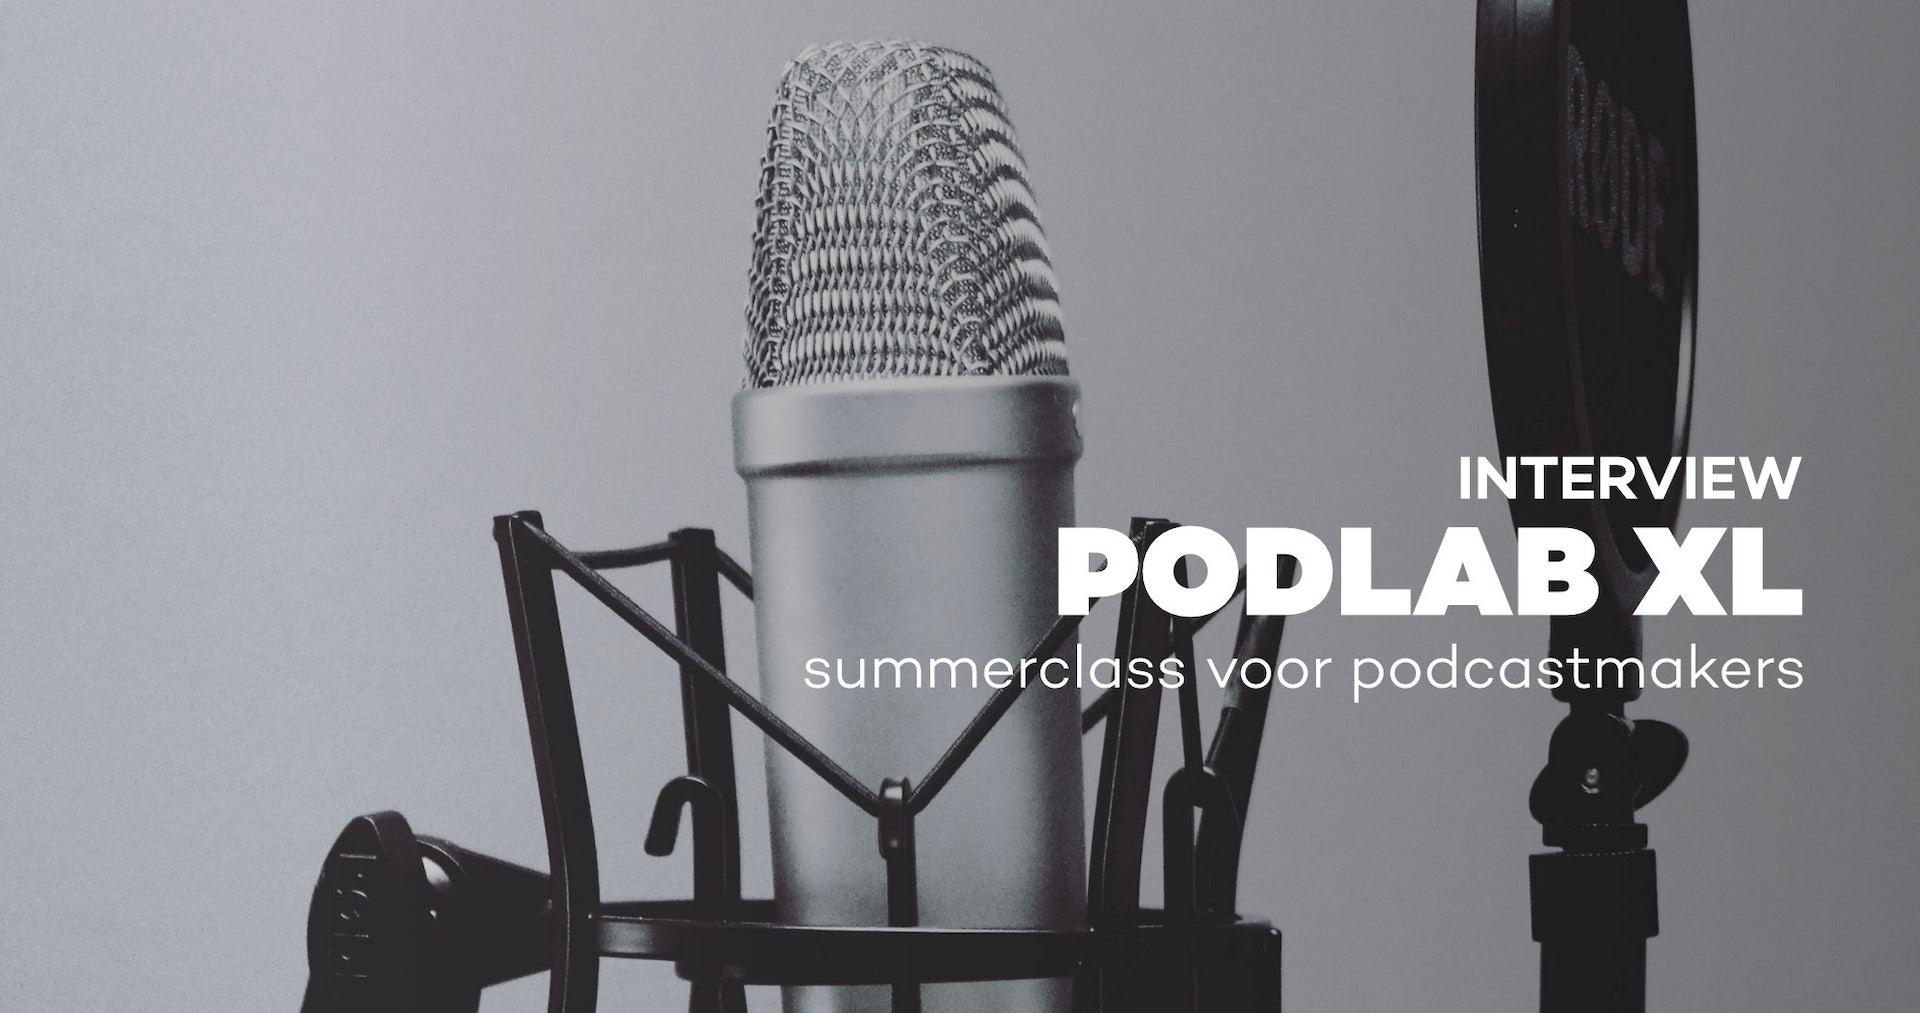 Podlab XL, summerclass voor podcastmakers